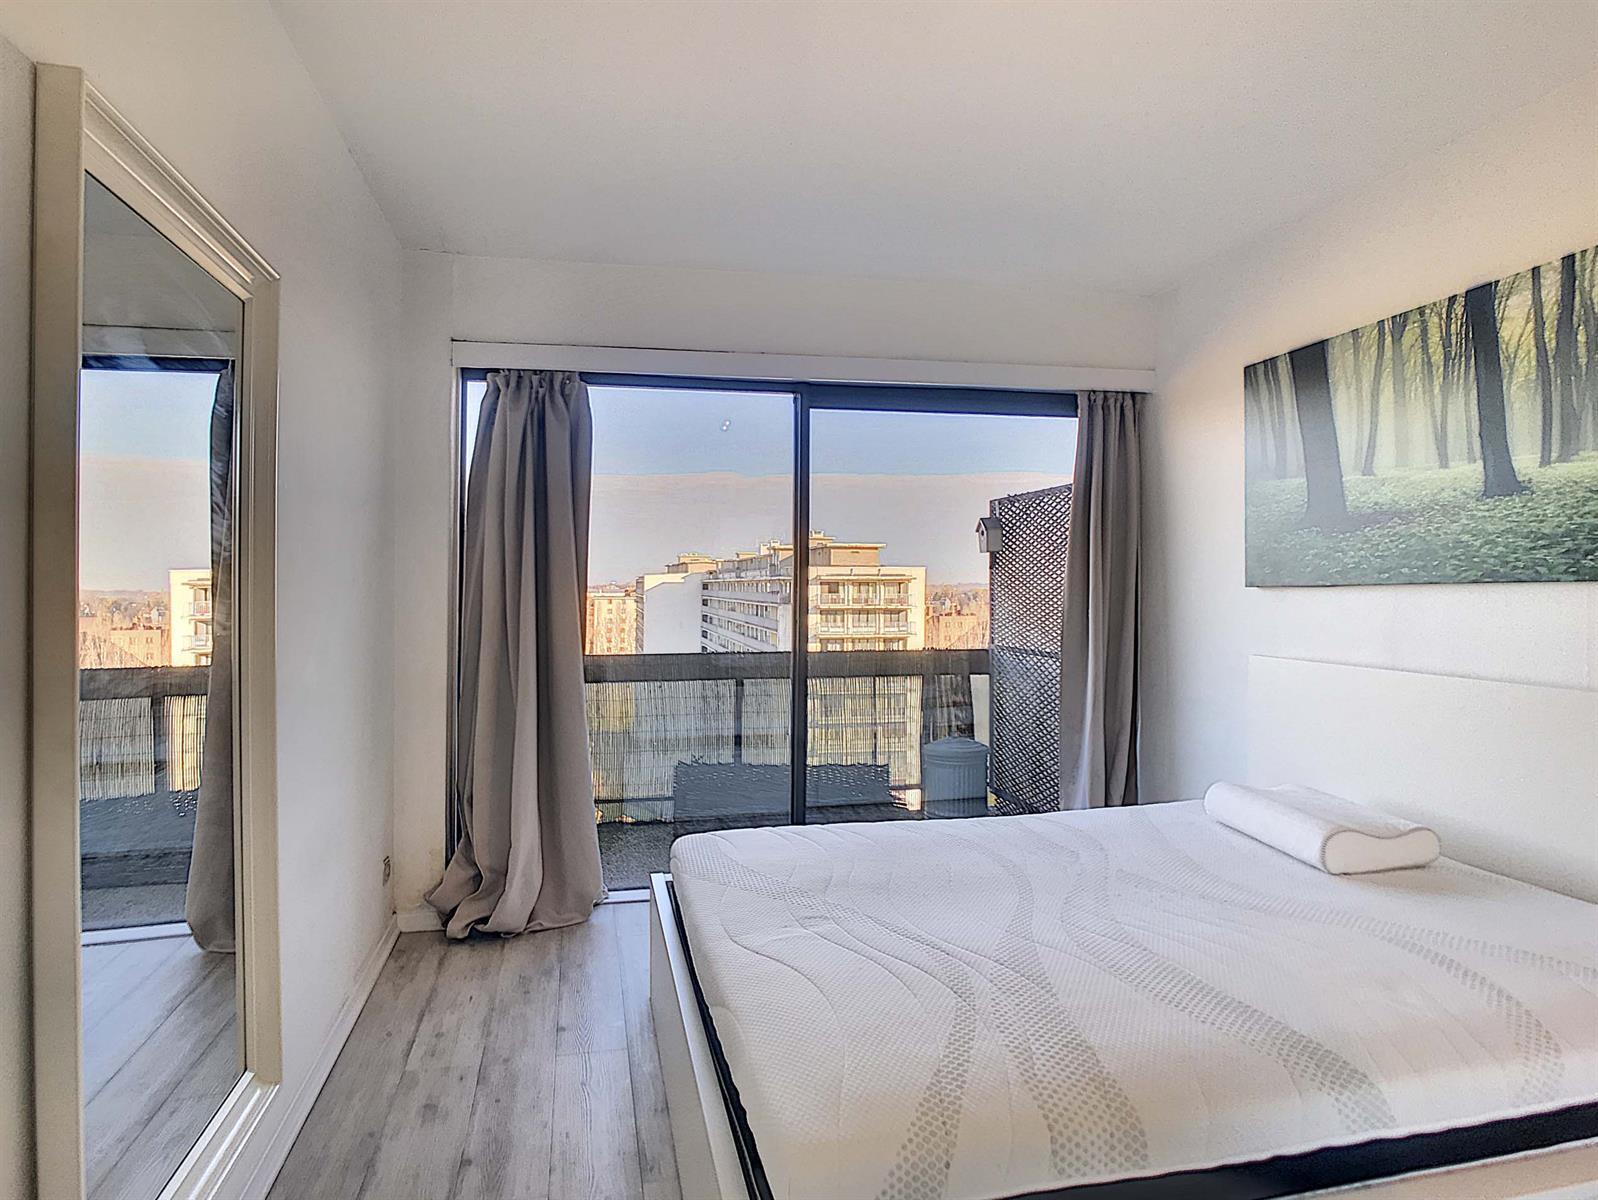 Appartement - Zaventem Sint-Stevens-Woluwe - #4218075-5